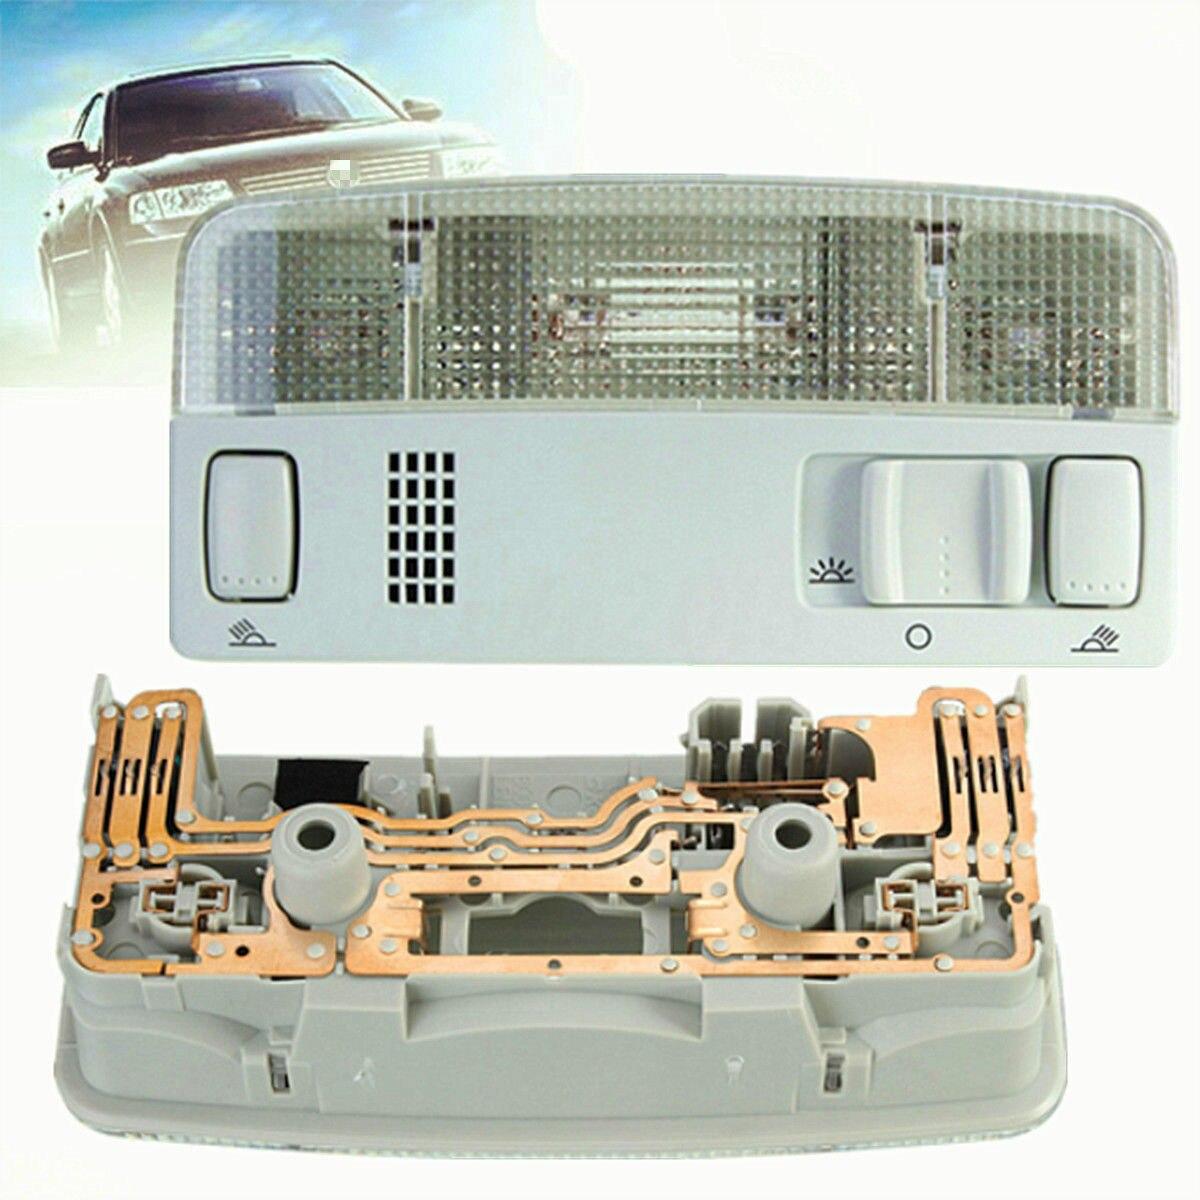 Luz de techo frontal Interior para coche, luz de lectura para autocaravana 1TD947105 para VW Transporter T5 Caddy 2K Passat Golf Mk4